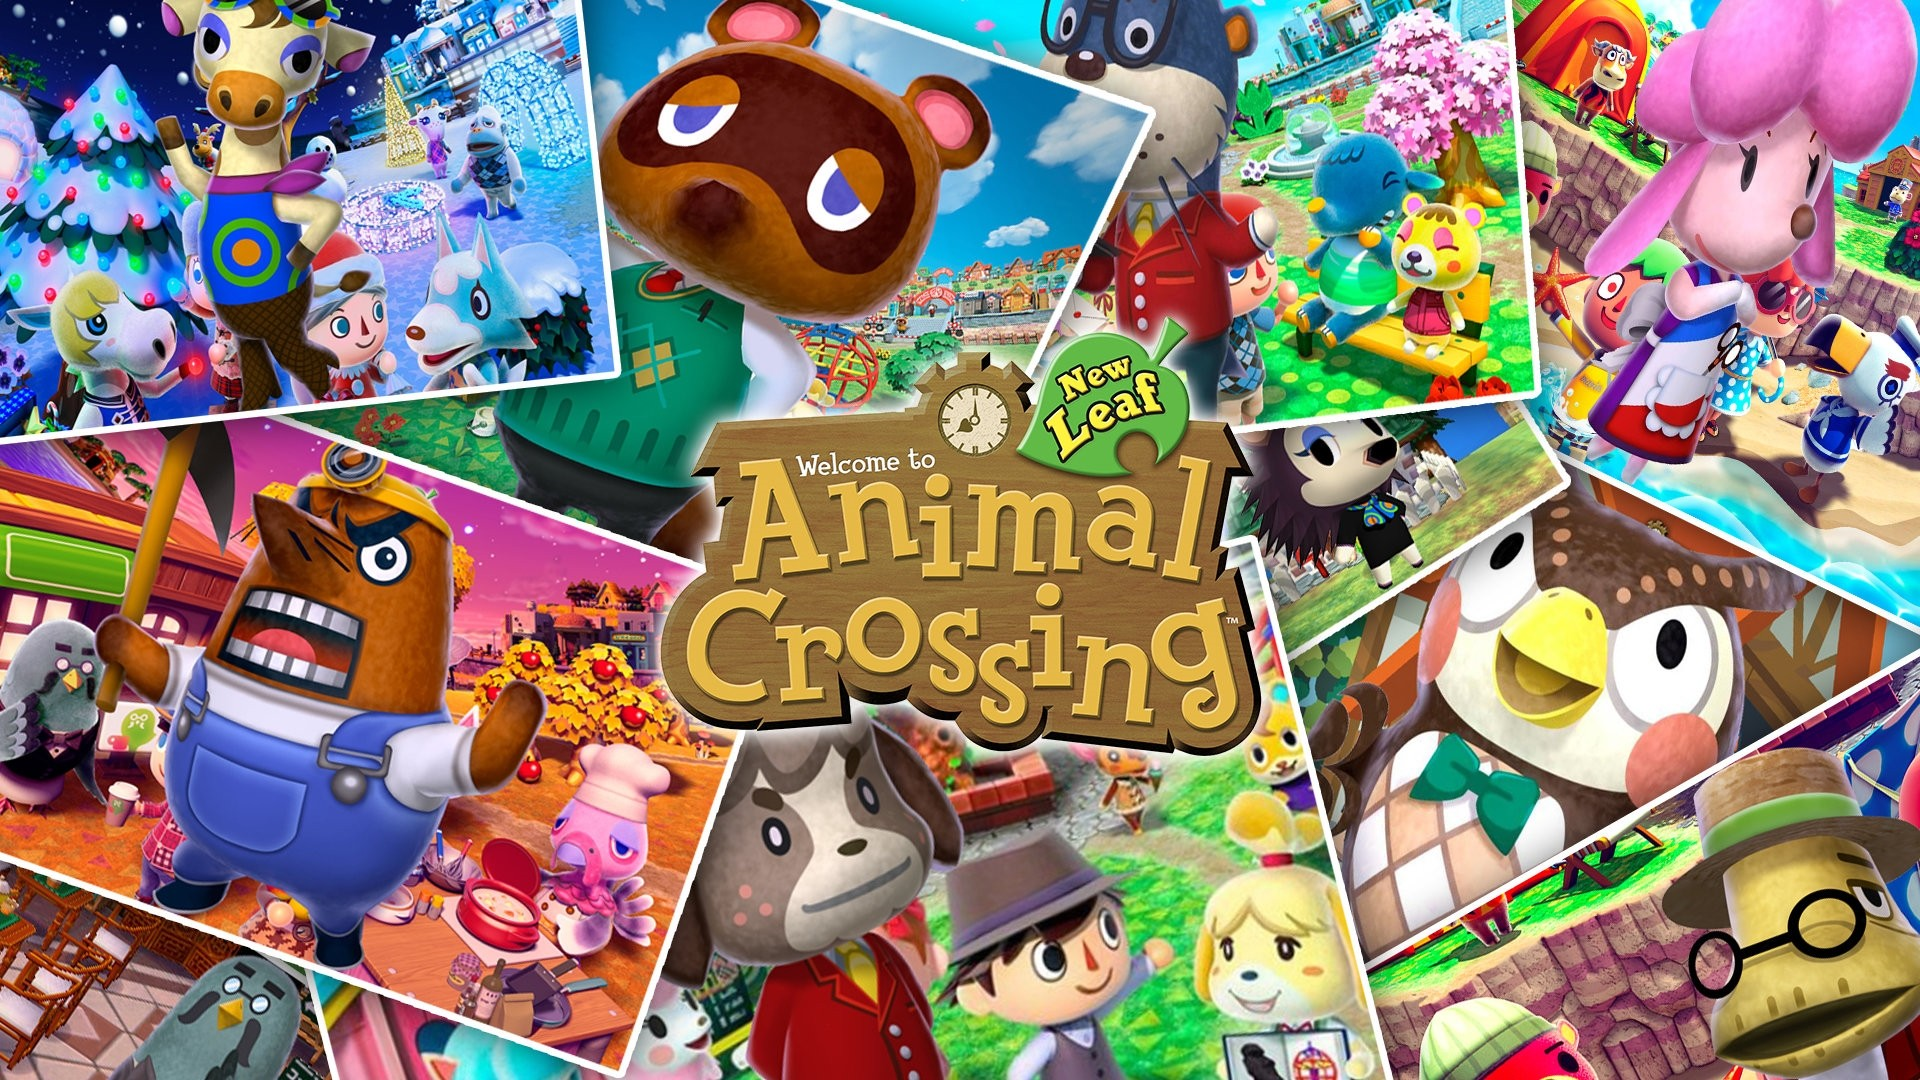 Animal Crossing wallpaper photo hd